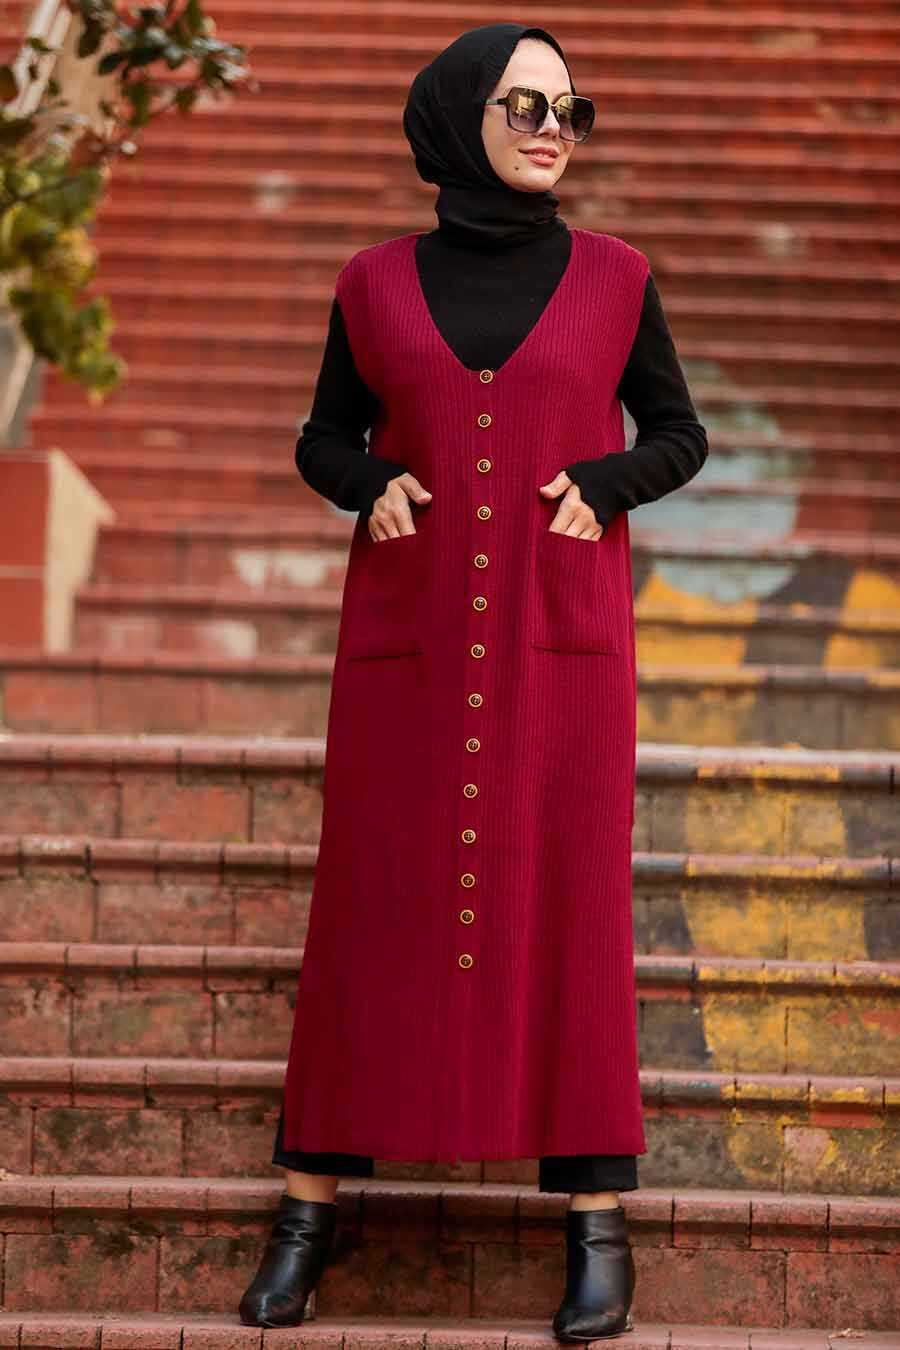 Claret Red Hijab Knitwear Vest 3324BR